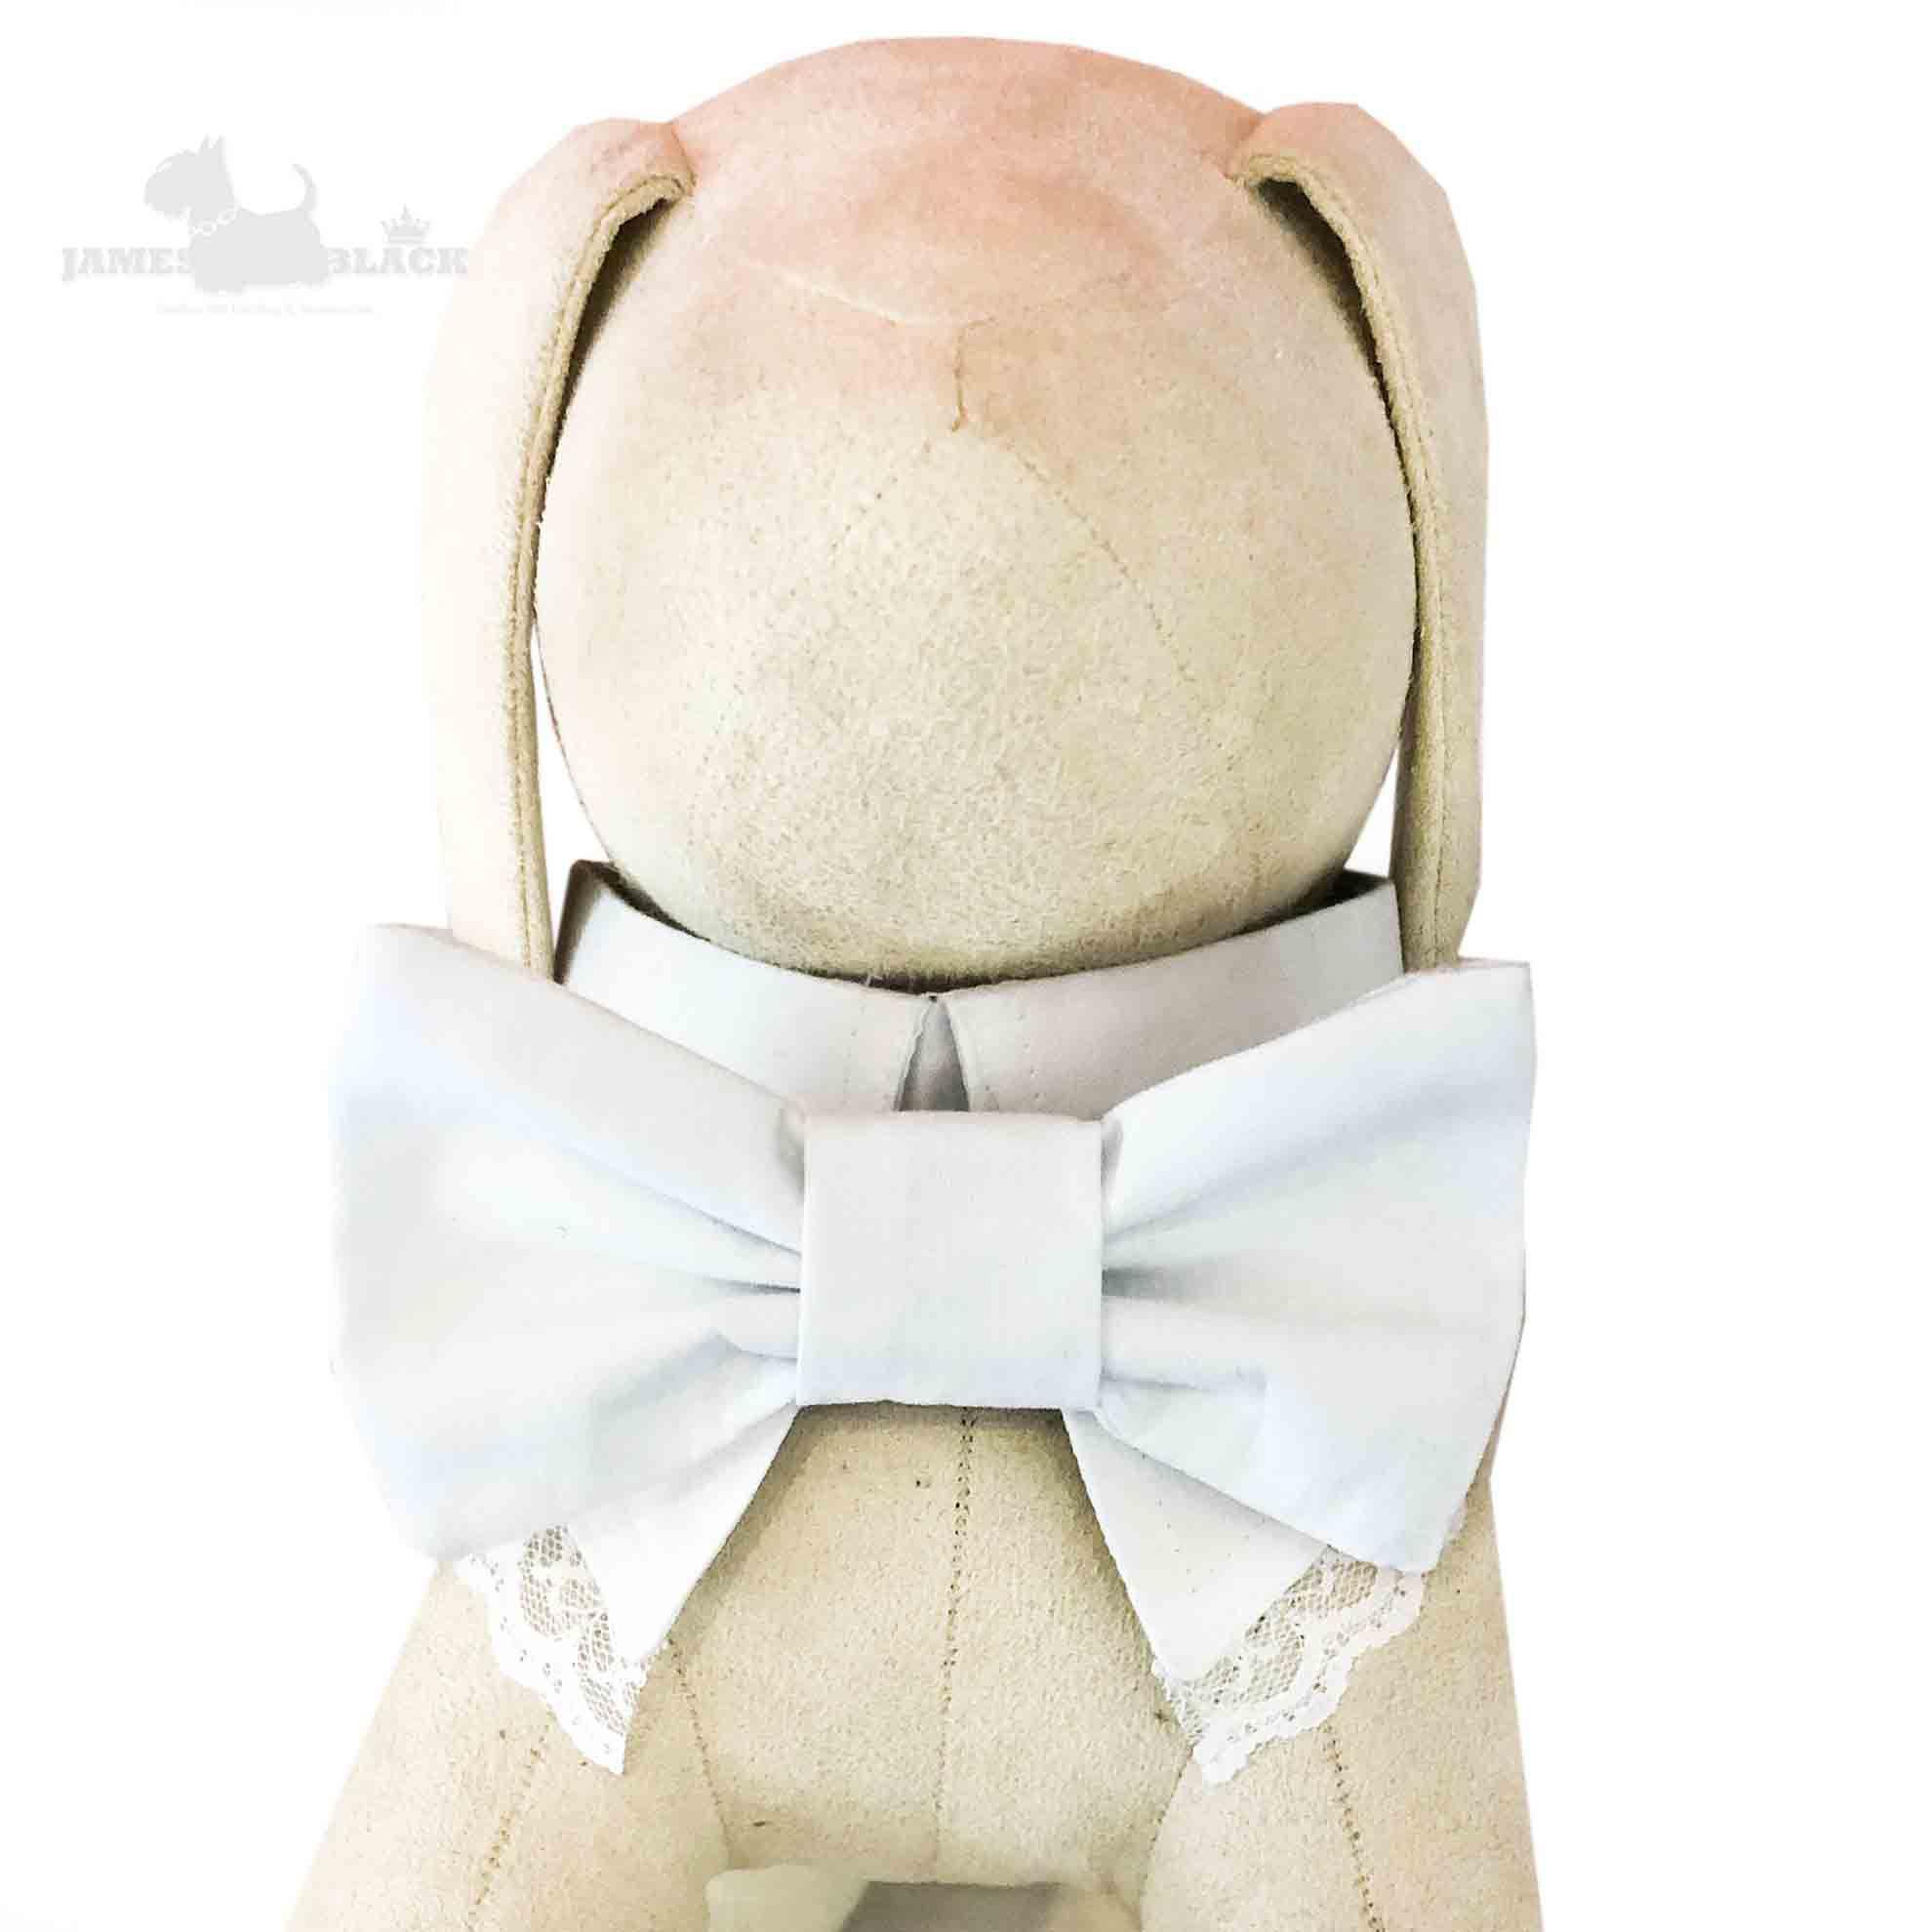 Colarinho com Gravata removível Branco  e renda branca